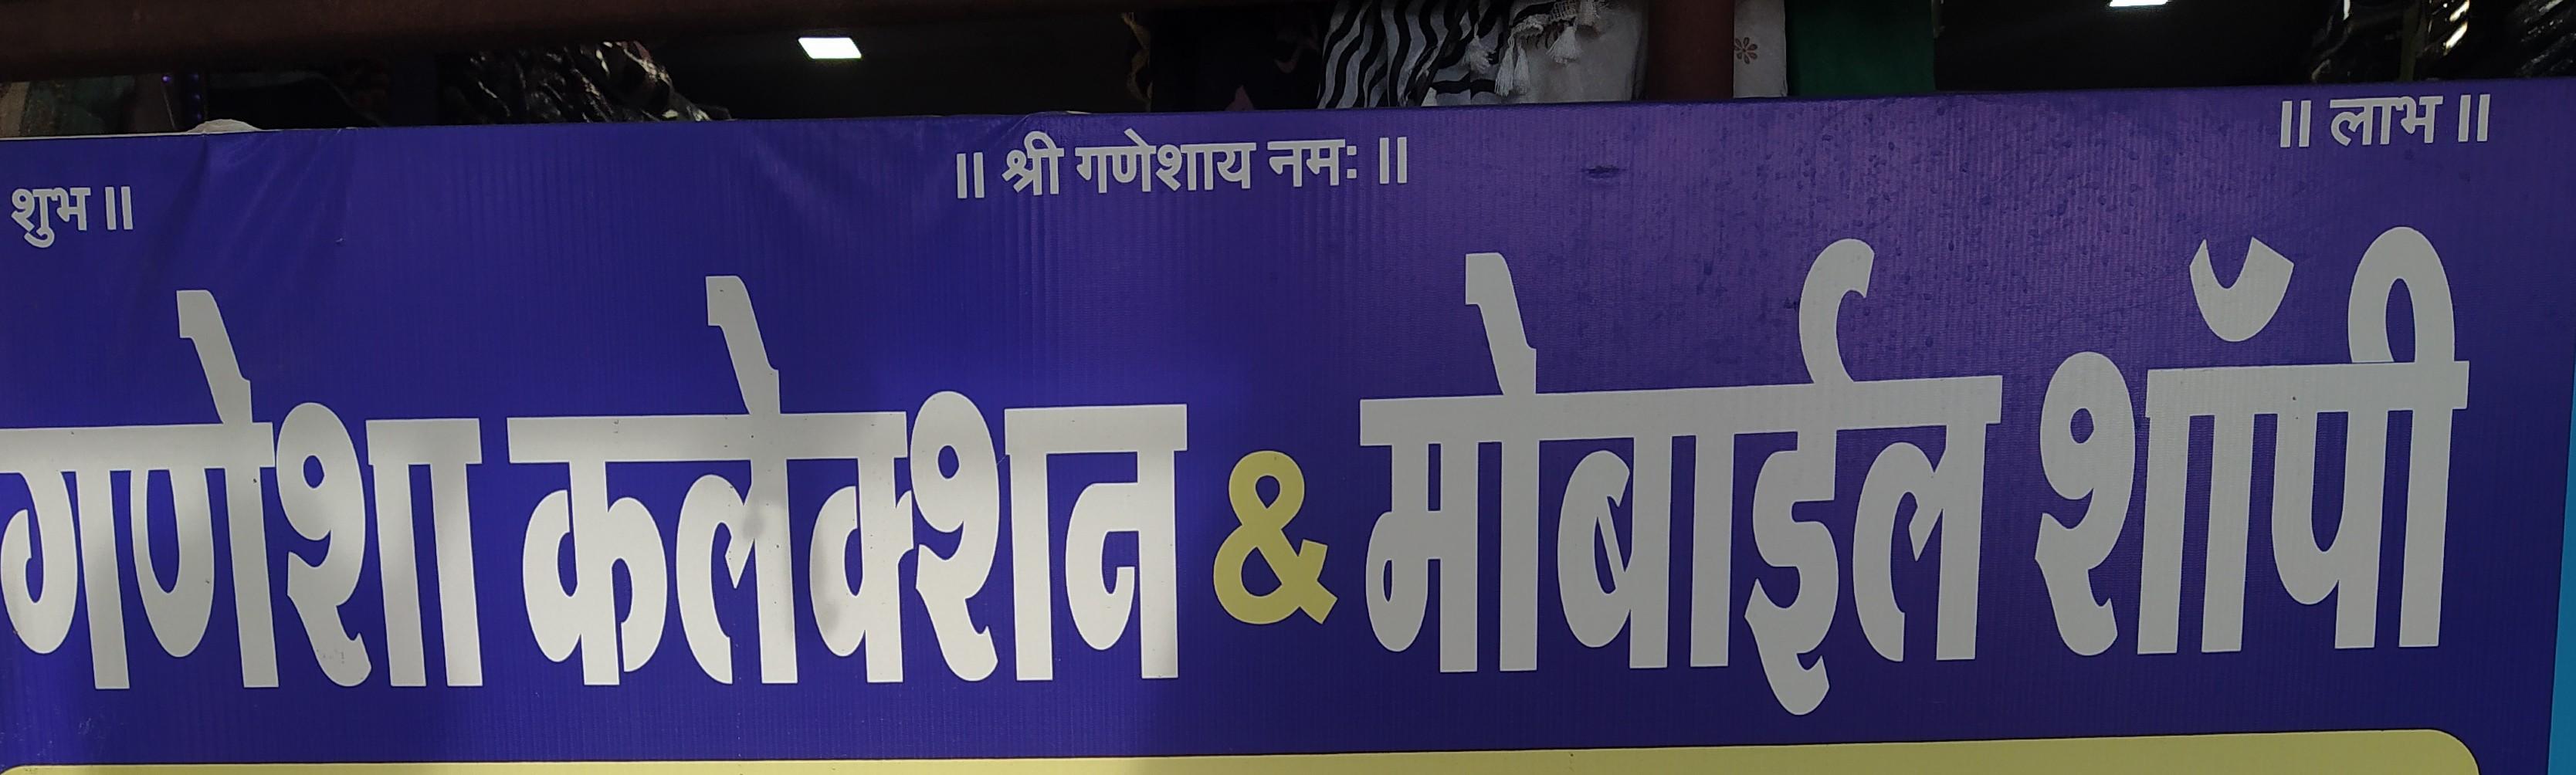 Ganesha collection & mobile shoppe